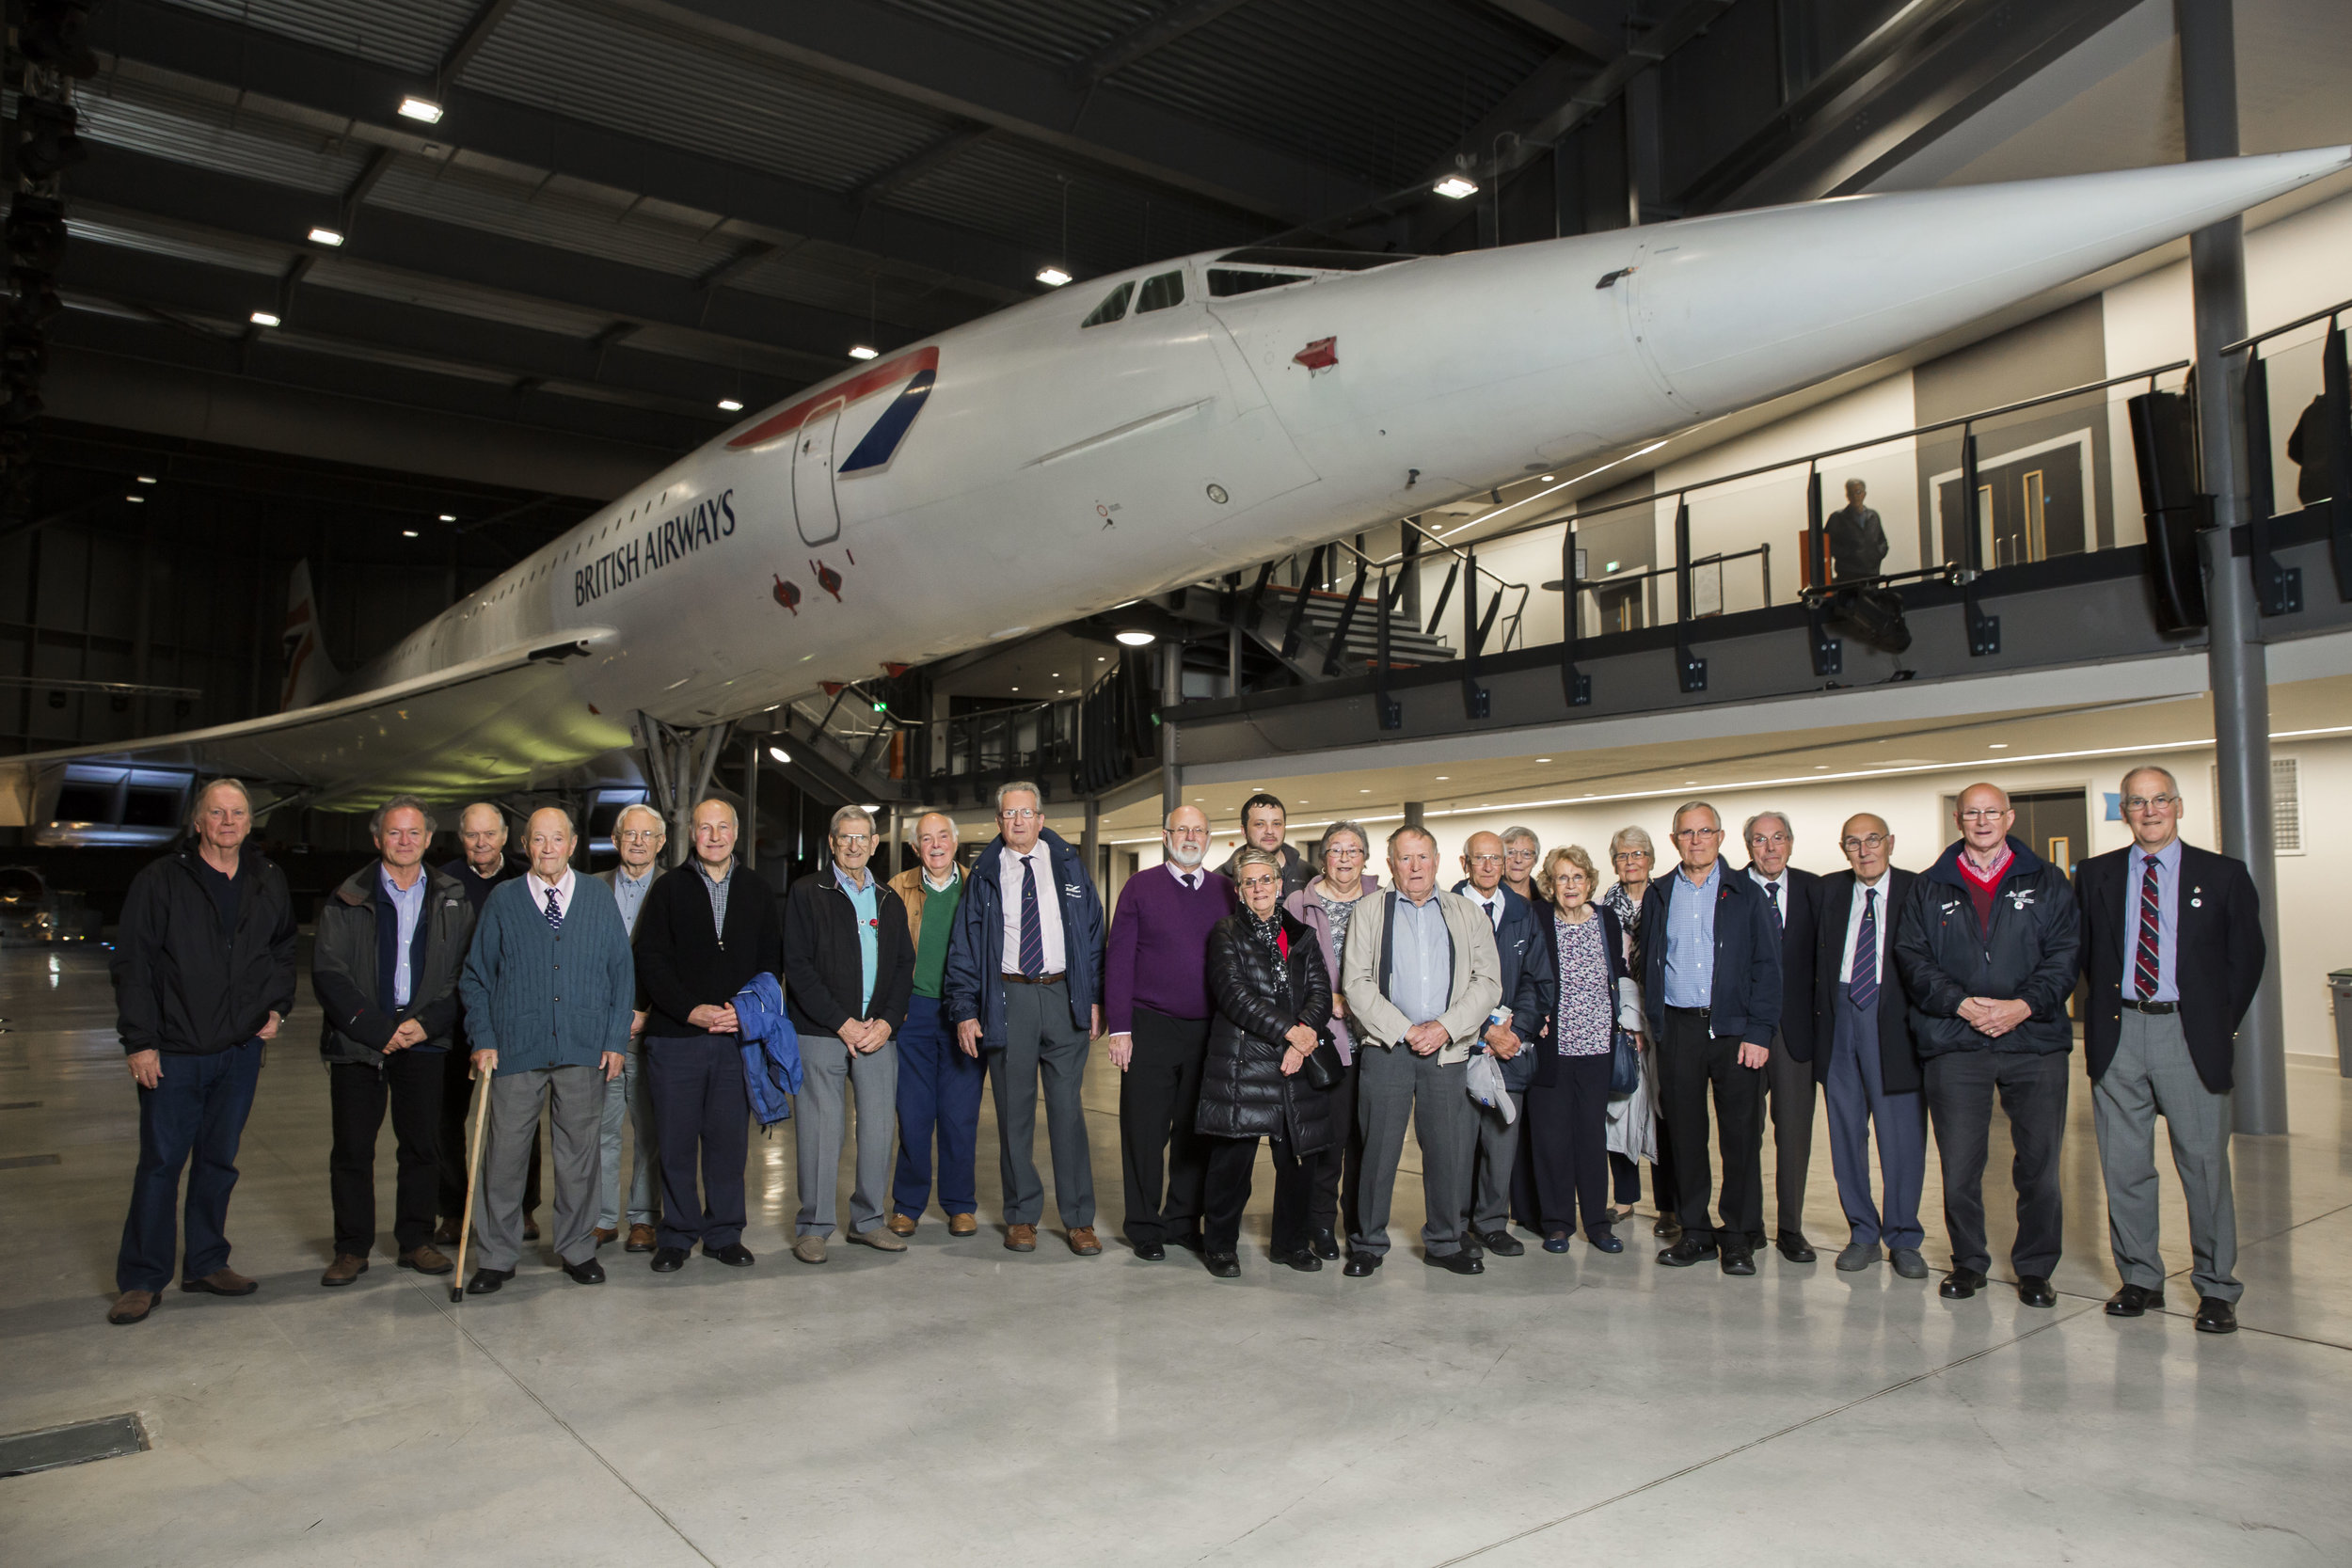 Aerospace_Bristol_Volunteers_44.JPG